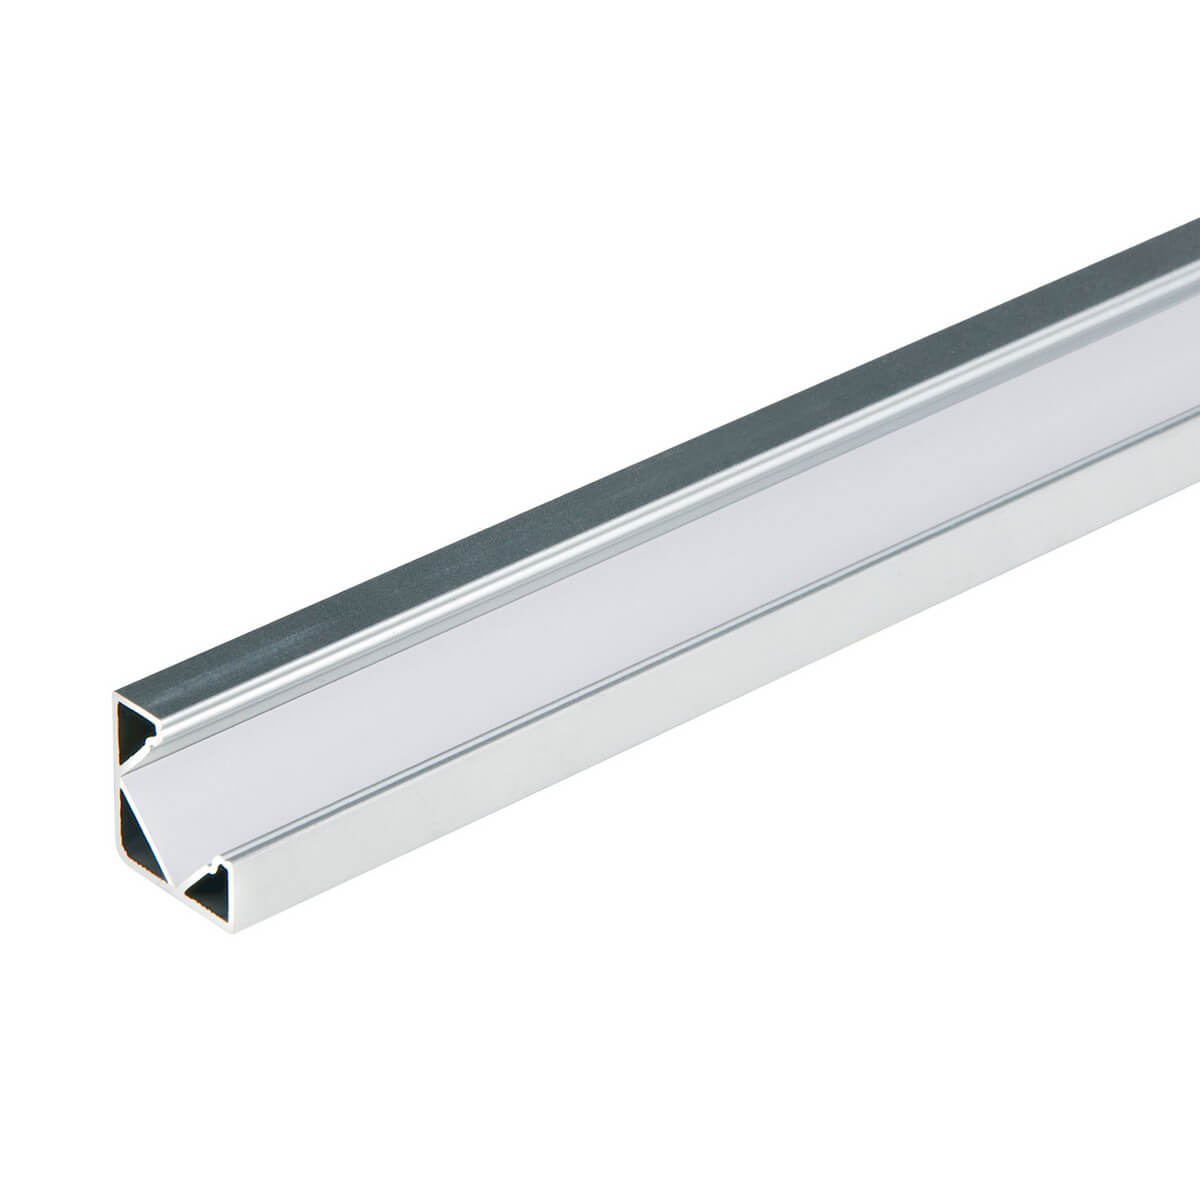 Профиль (UL-00004052) Uniel UFE-A13 Silver 200 Polybag панель для планшета 9 inch allwinner a13 a10 q9 n9 aoson m92 opd tpc0027 for allwinner a13 a10 opd tpc0027